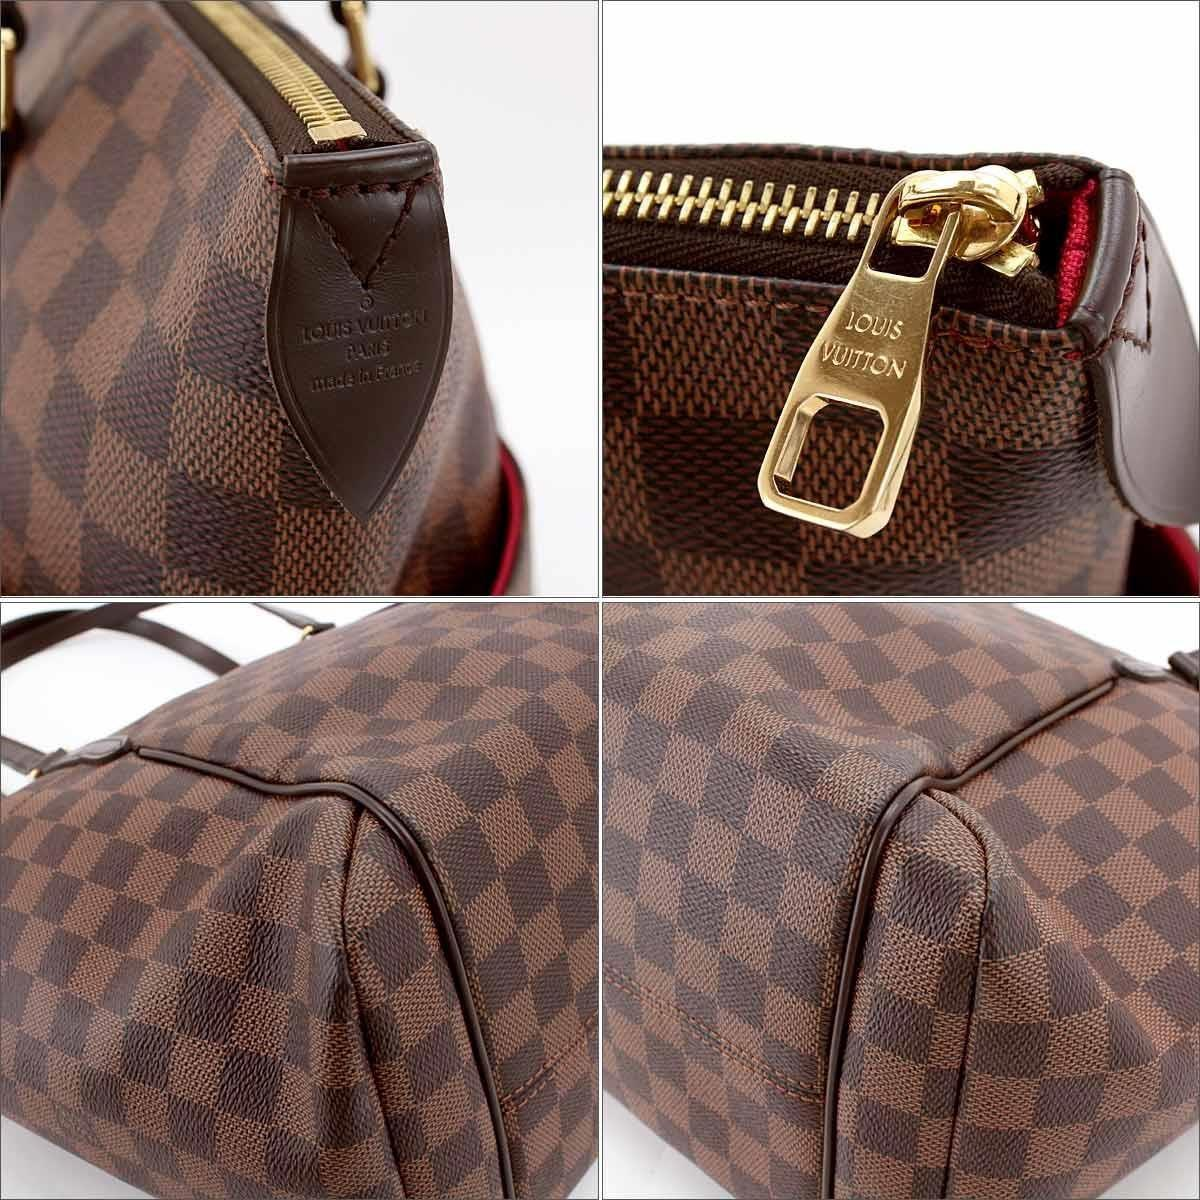 b9c76986e20 Lyst - Louis Vuitton Damier Totally Mm Tote Bag Canvas Ebene N41281 ...